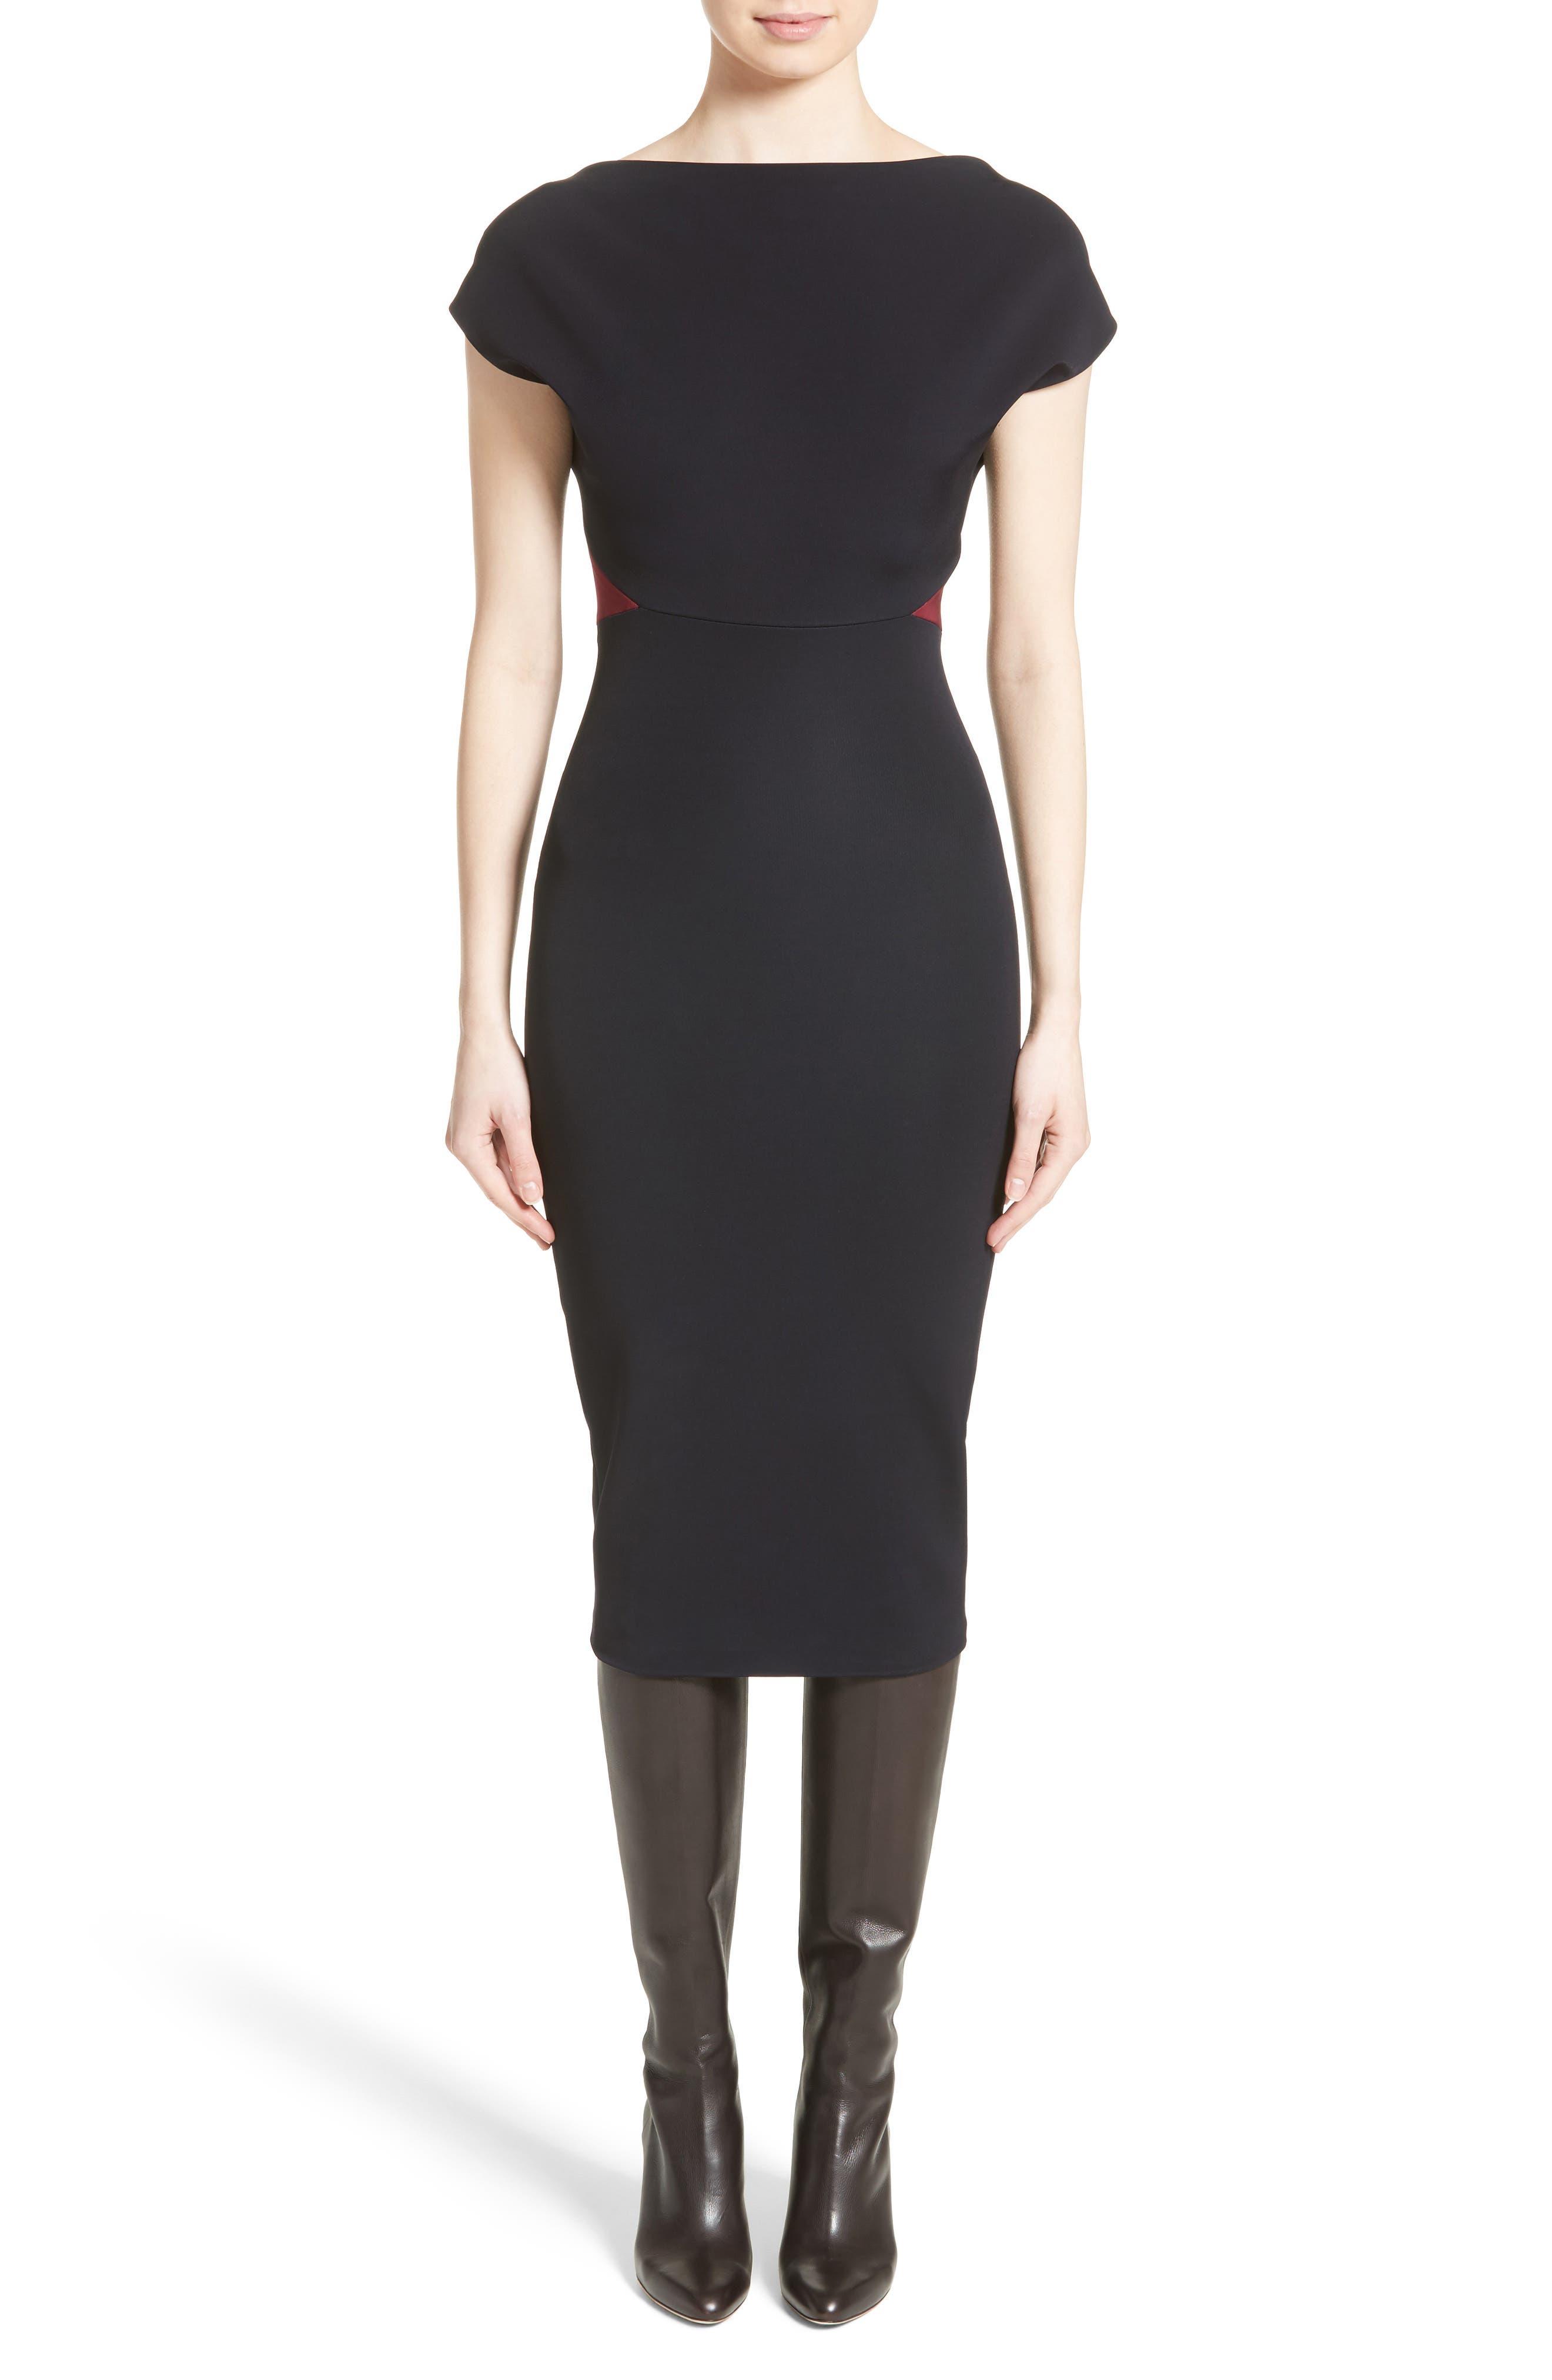 Victoria Beckham Open Back Rib Knit Dress